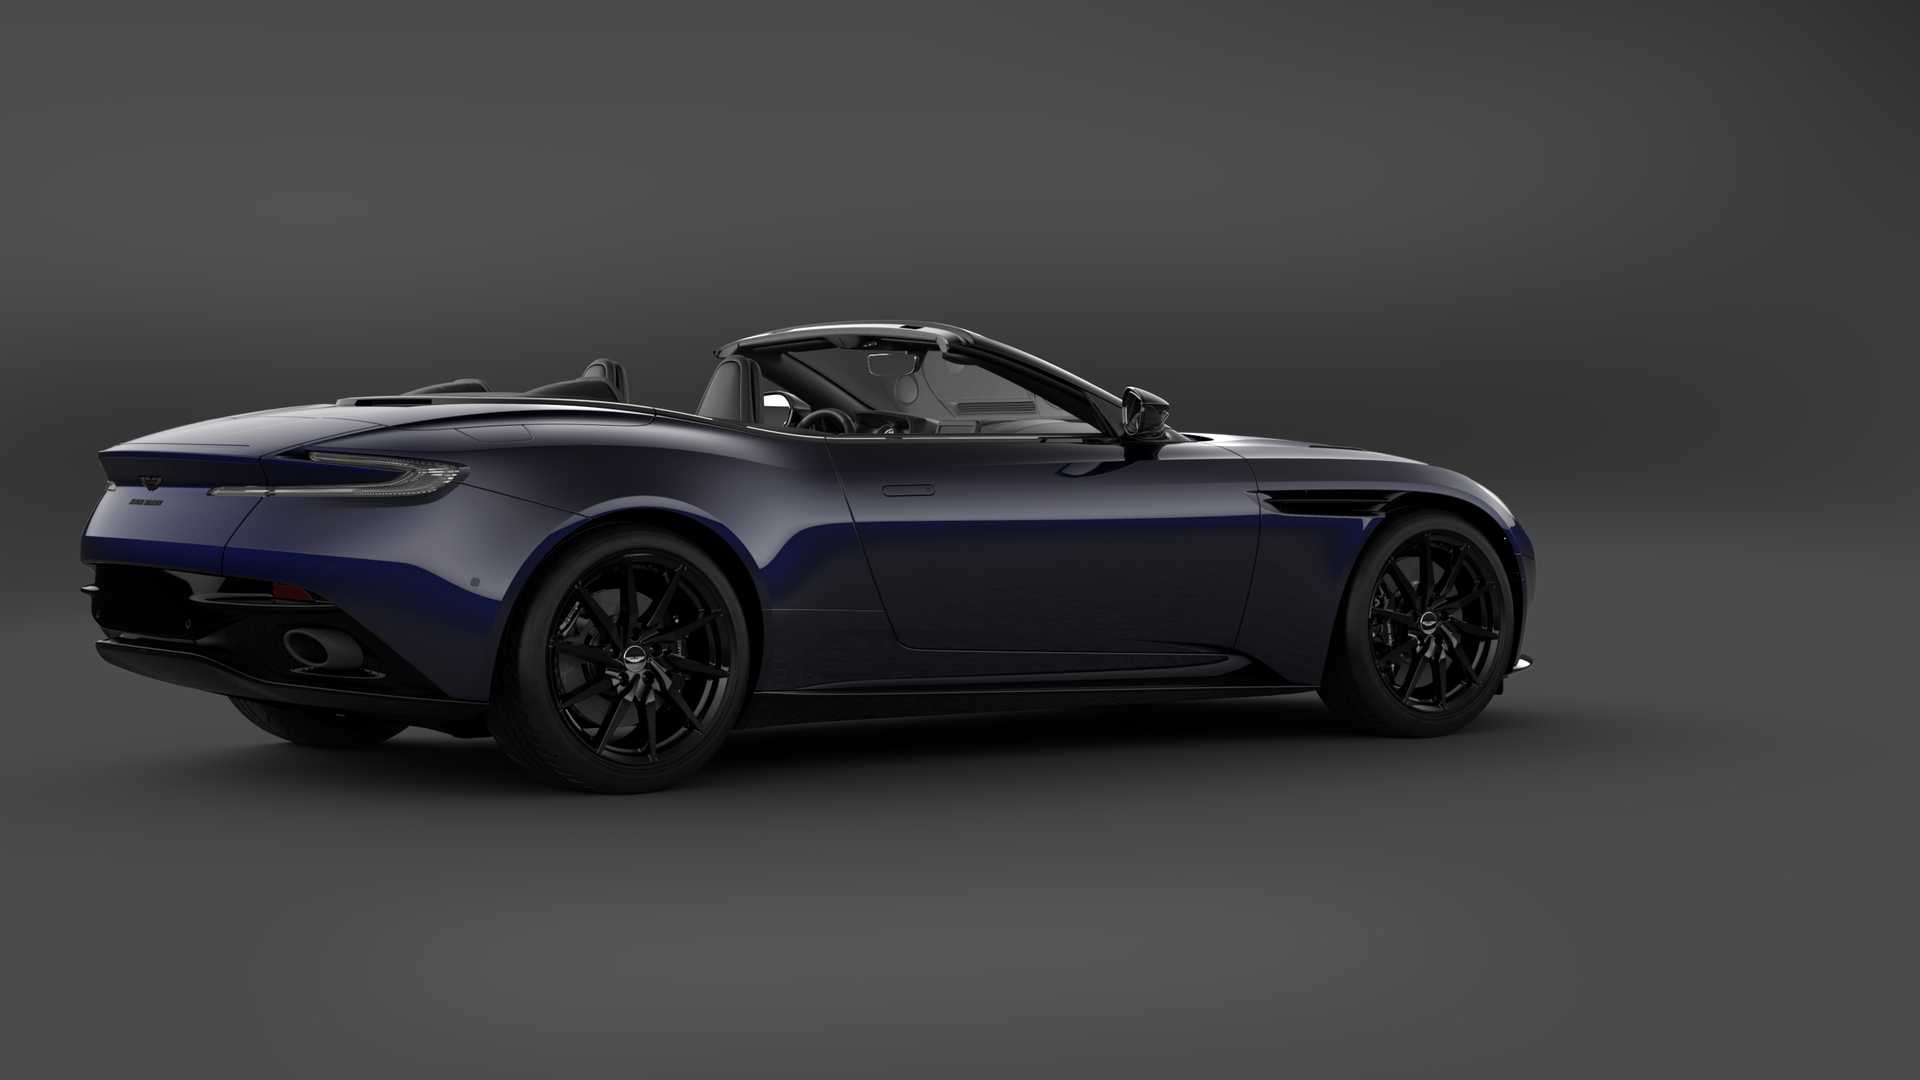 Aston-Martin-DB11-V8-Shadow-Edition-10